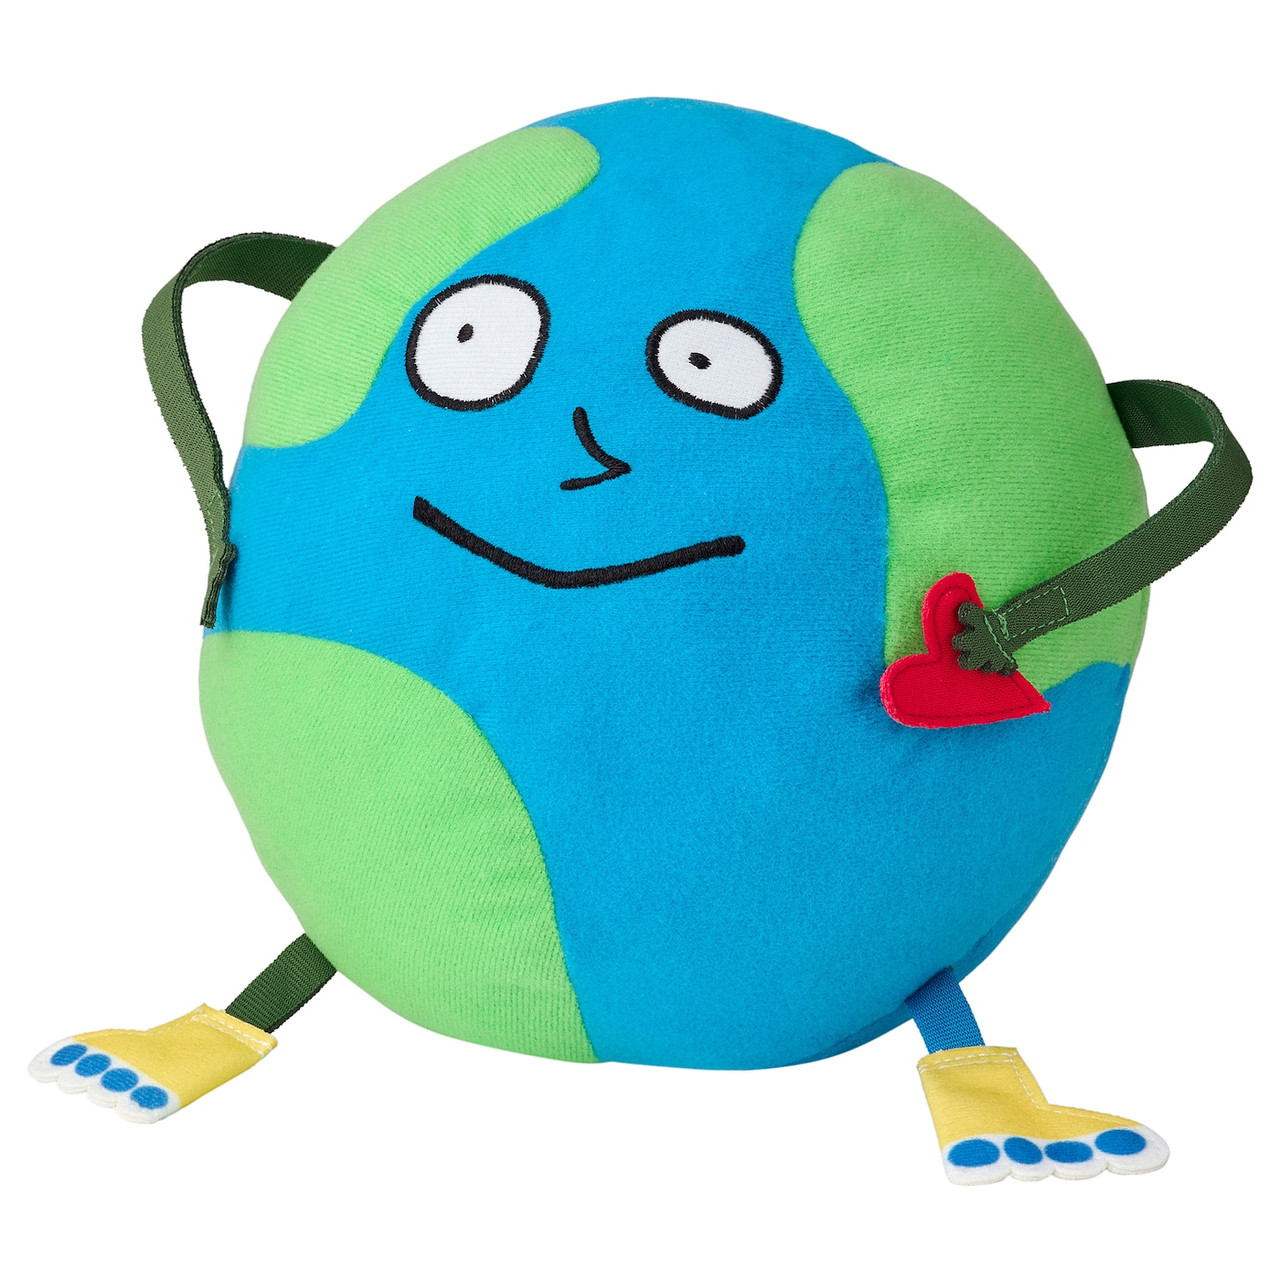 IKEA SAGOSKATT М'яка іграшка, Людина, глобус